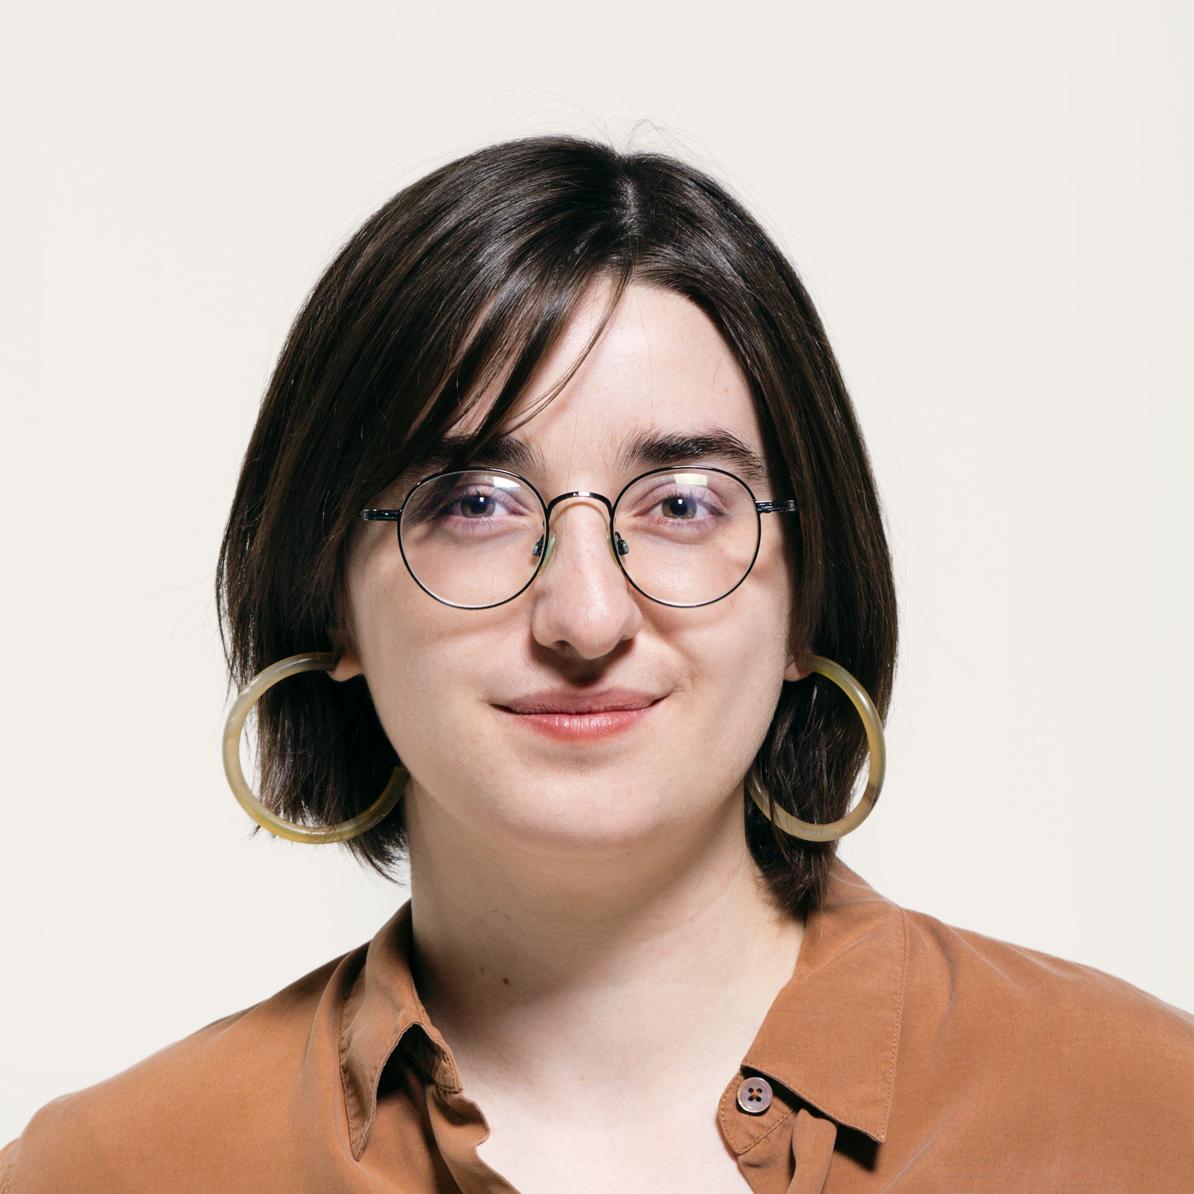 Chloe Yanny-Tillar